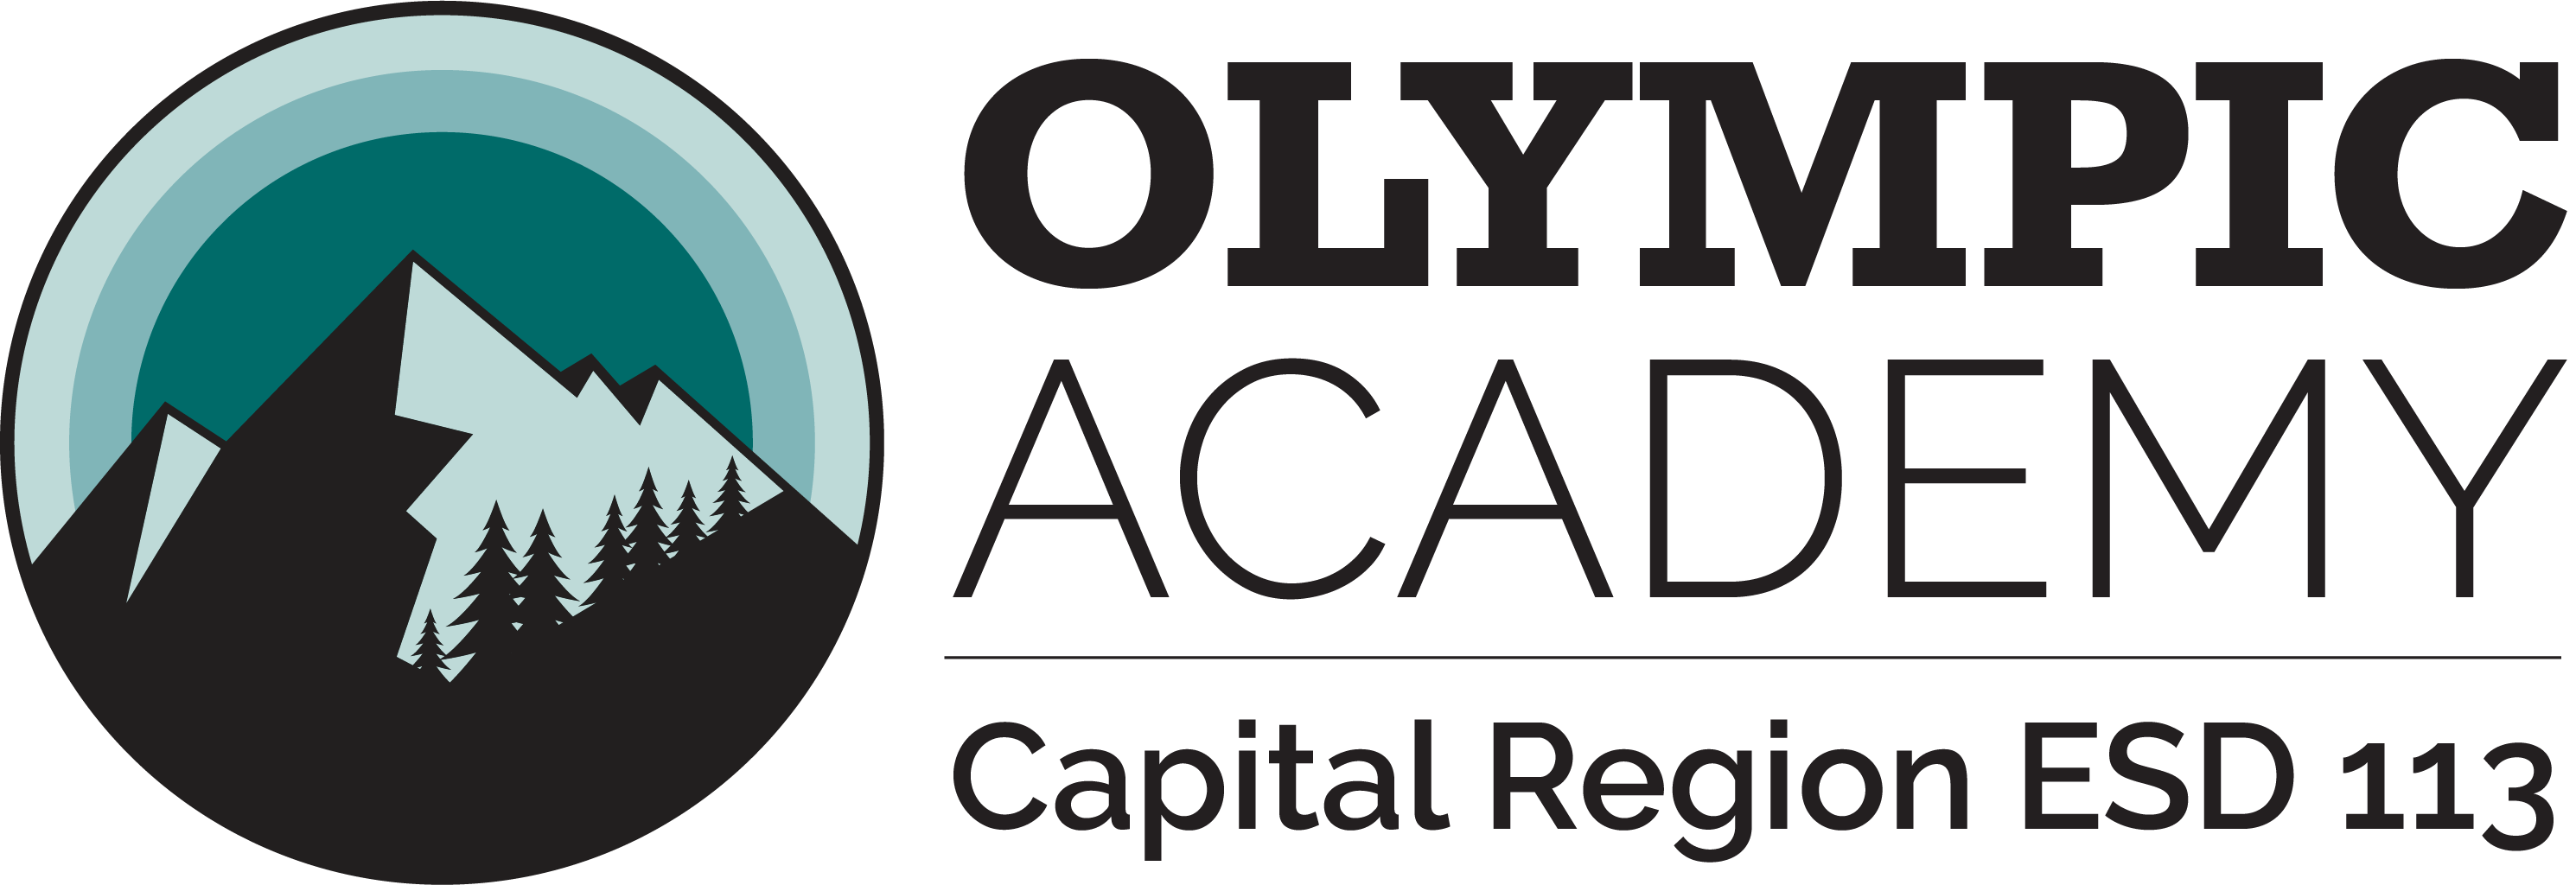 Olympic Academy - Capital Region ESD 113